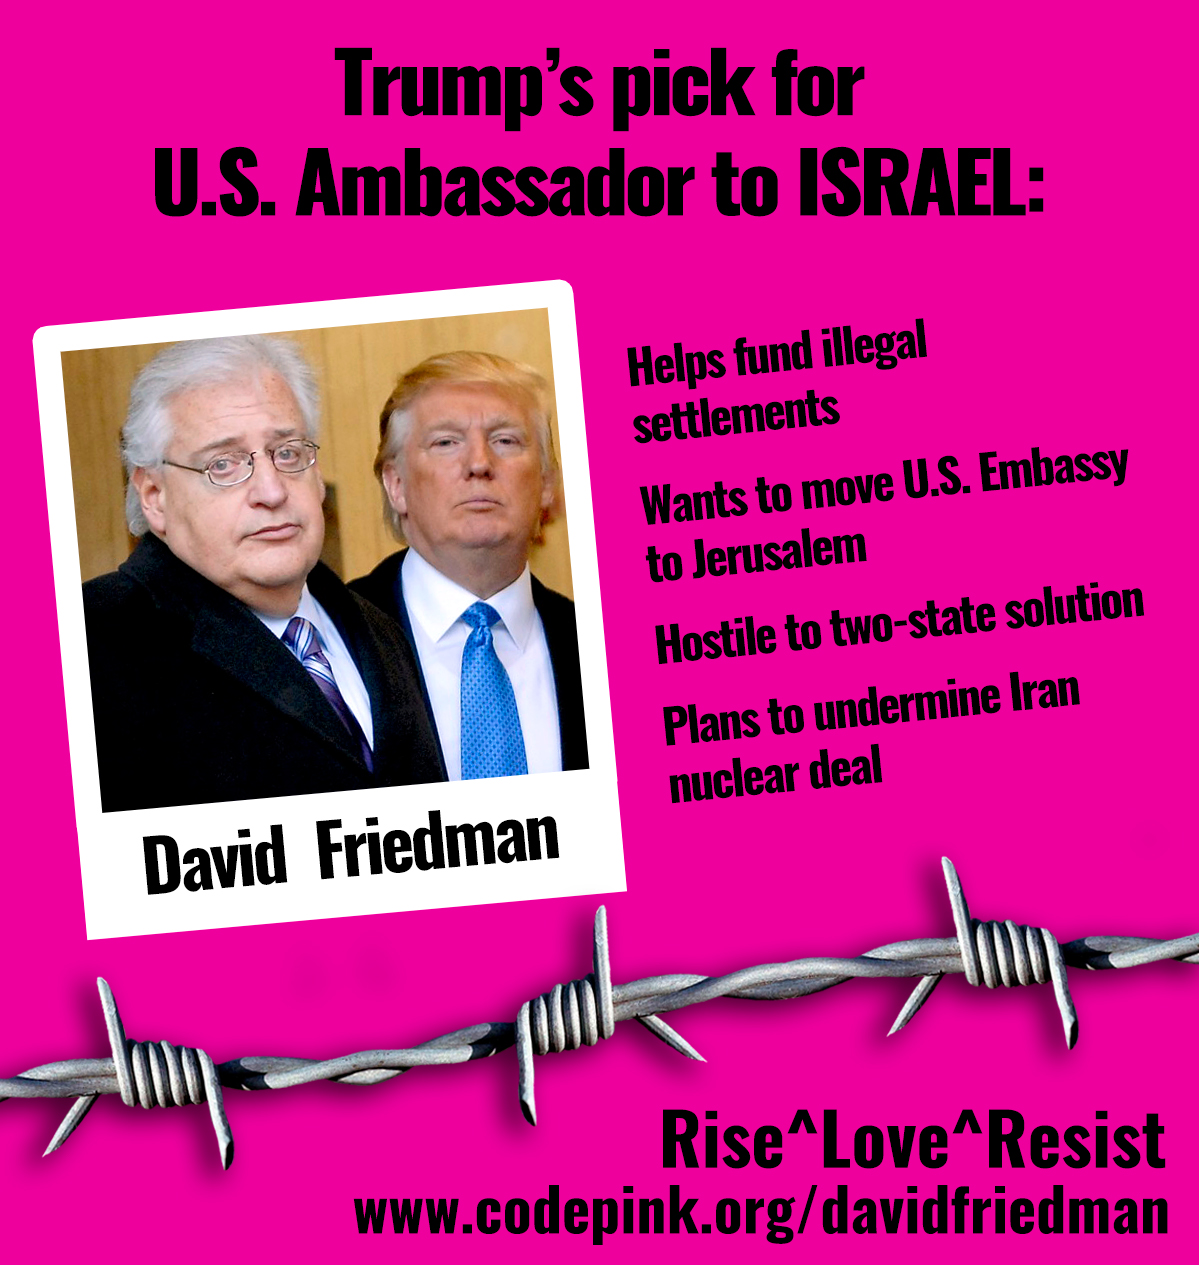 TrumpFriedman.jpg